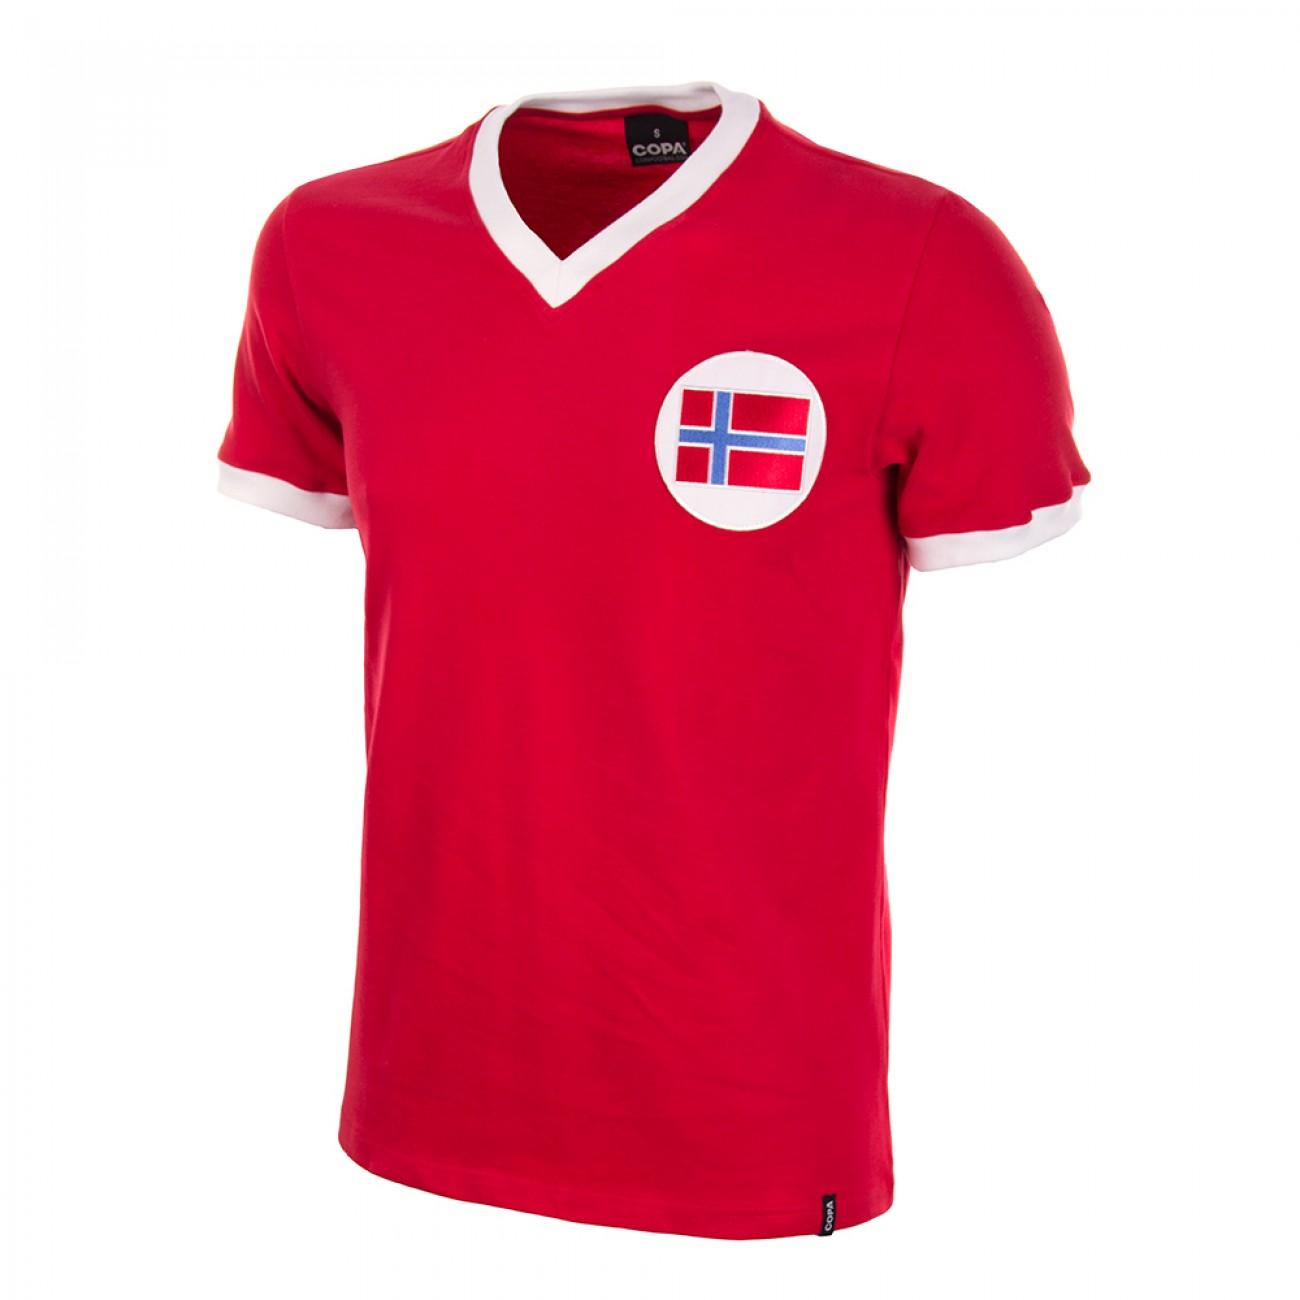 http://www.retrofootball.es/ropa-de-futbol/camiseta-retro-noruega-a-os-70.html